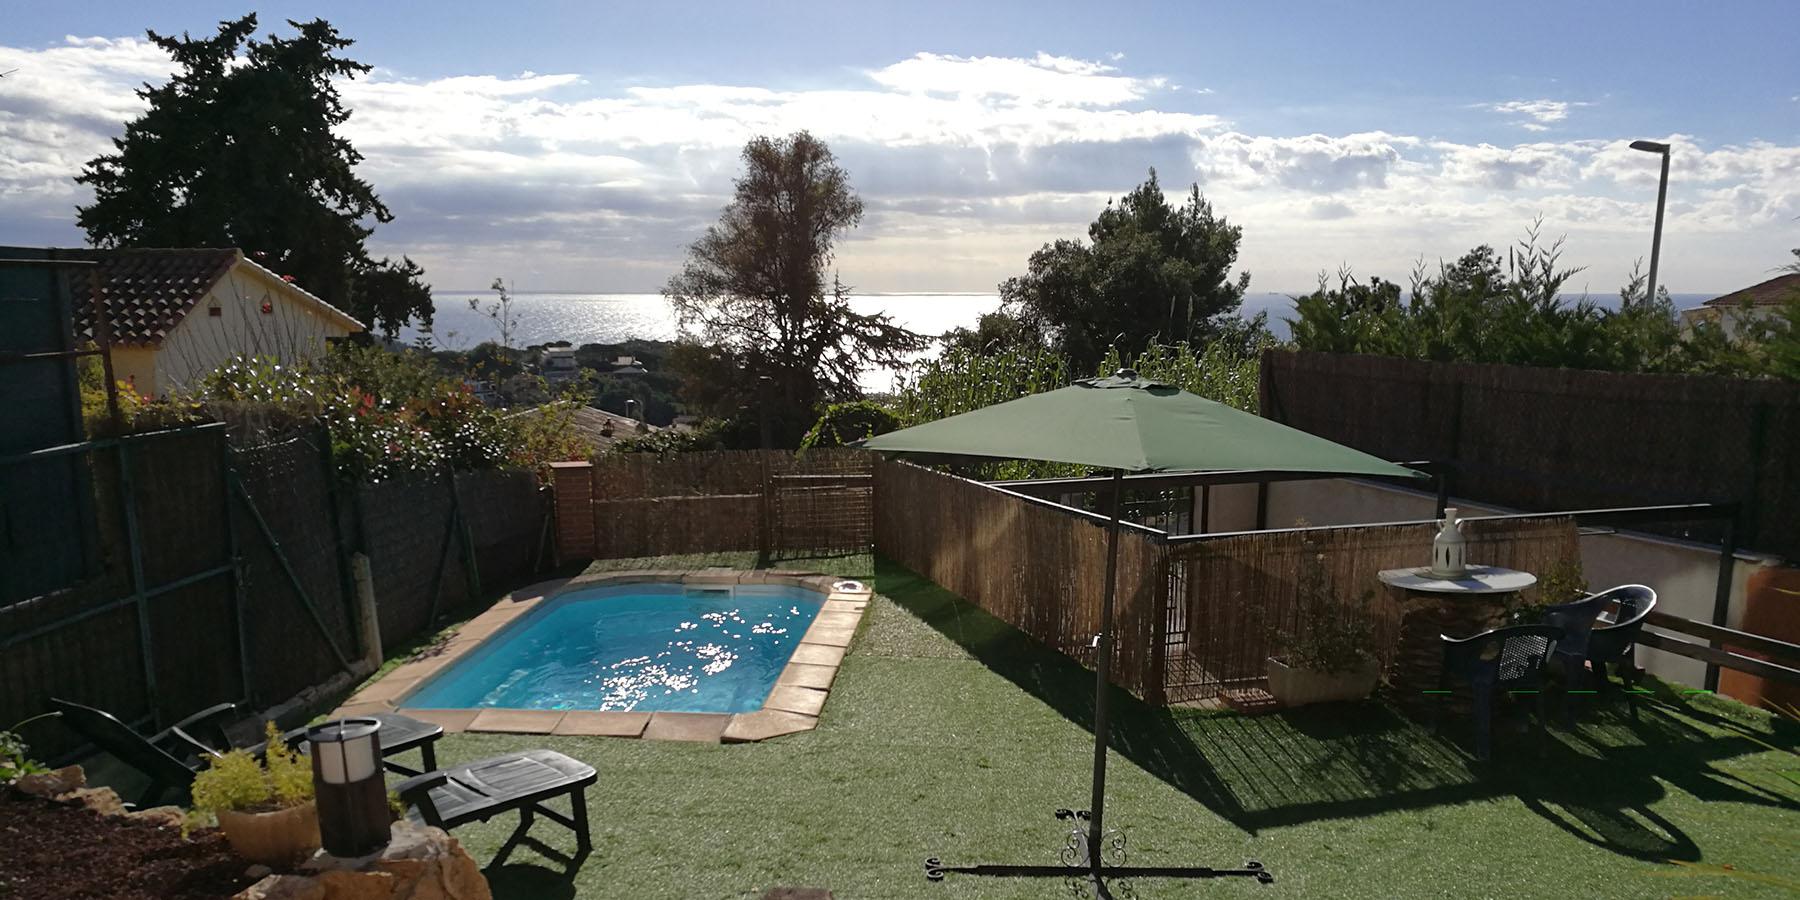 Casa amb piscina, jardí i barbacoa